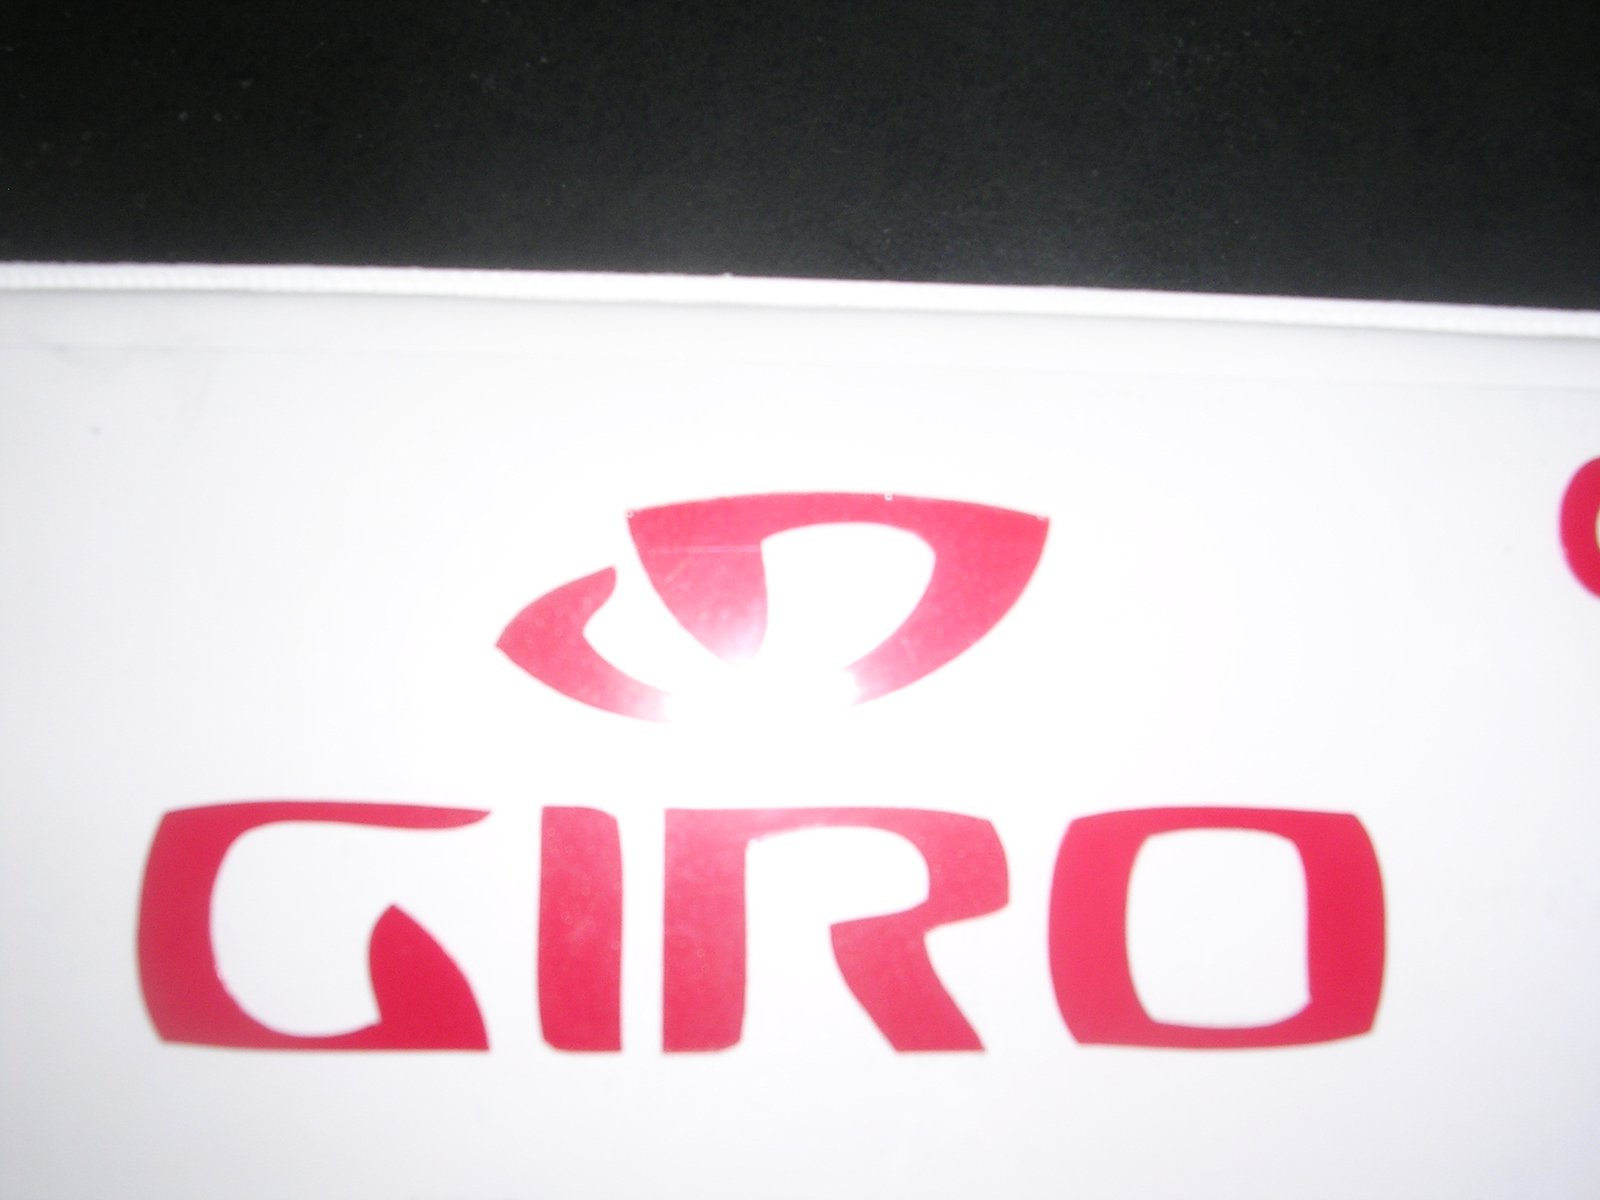 Giro sticker i have made